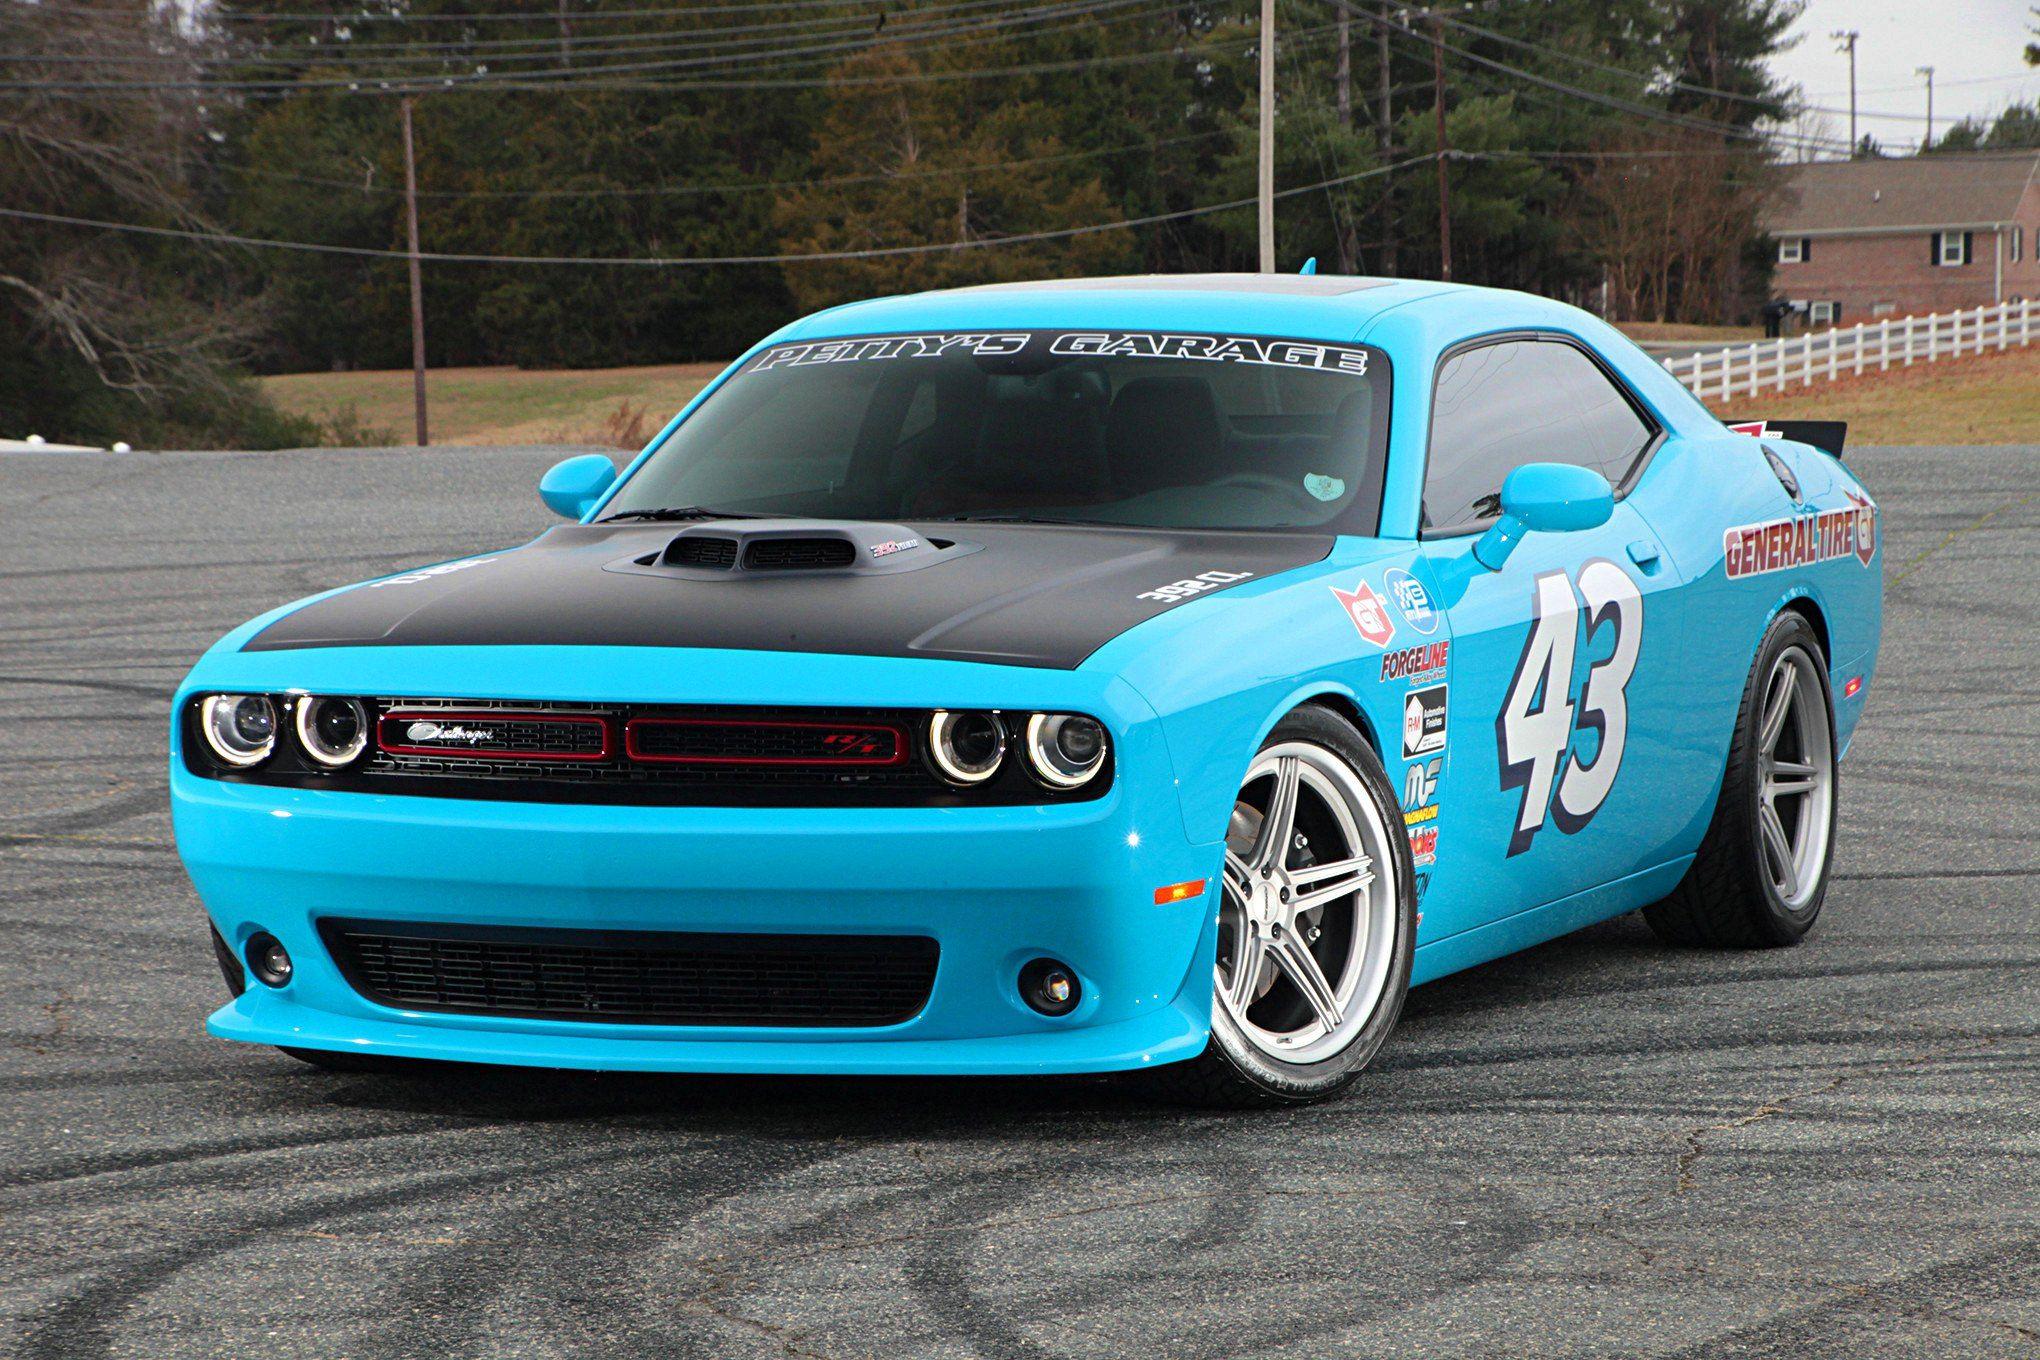 medium resolution of baby blue dodge challenger looking good with custom halo headlights